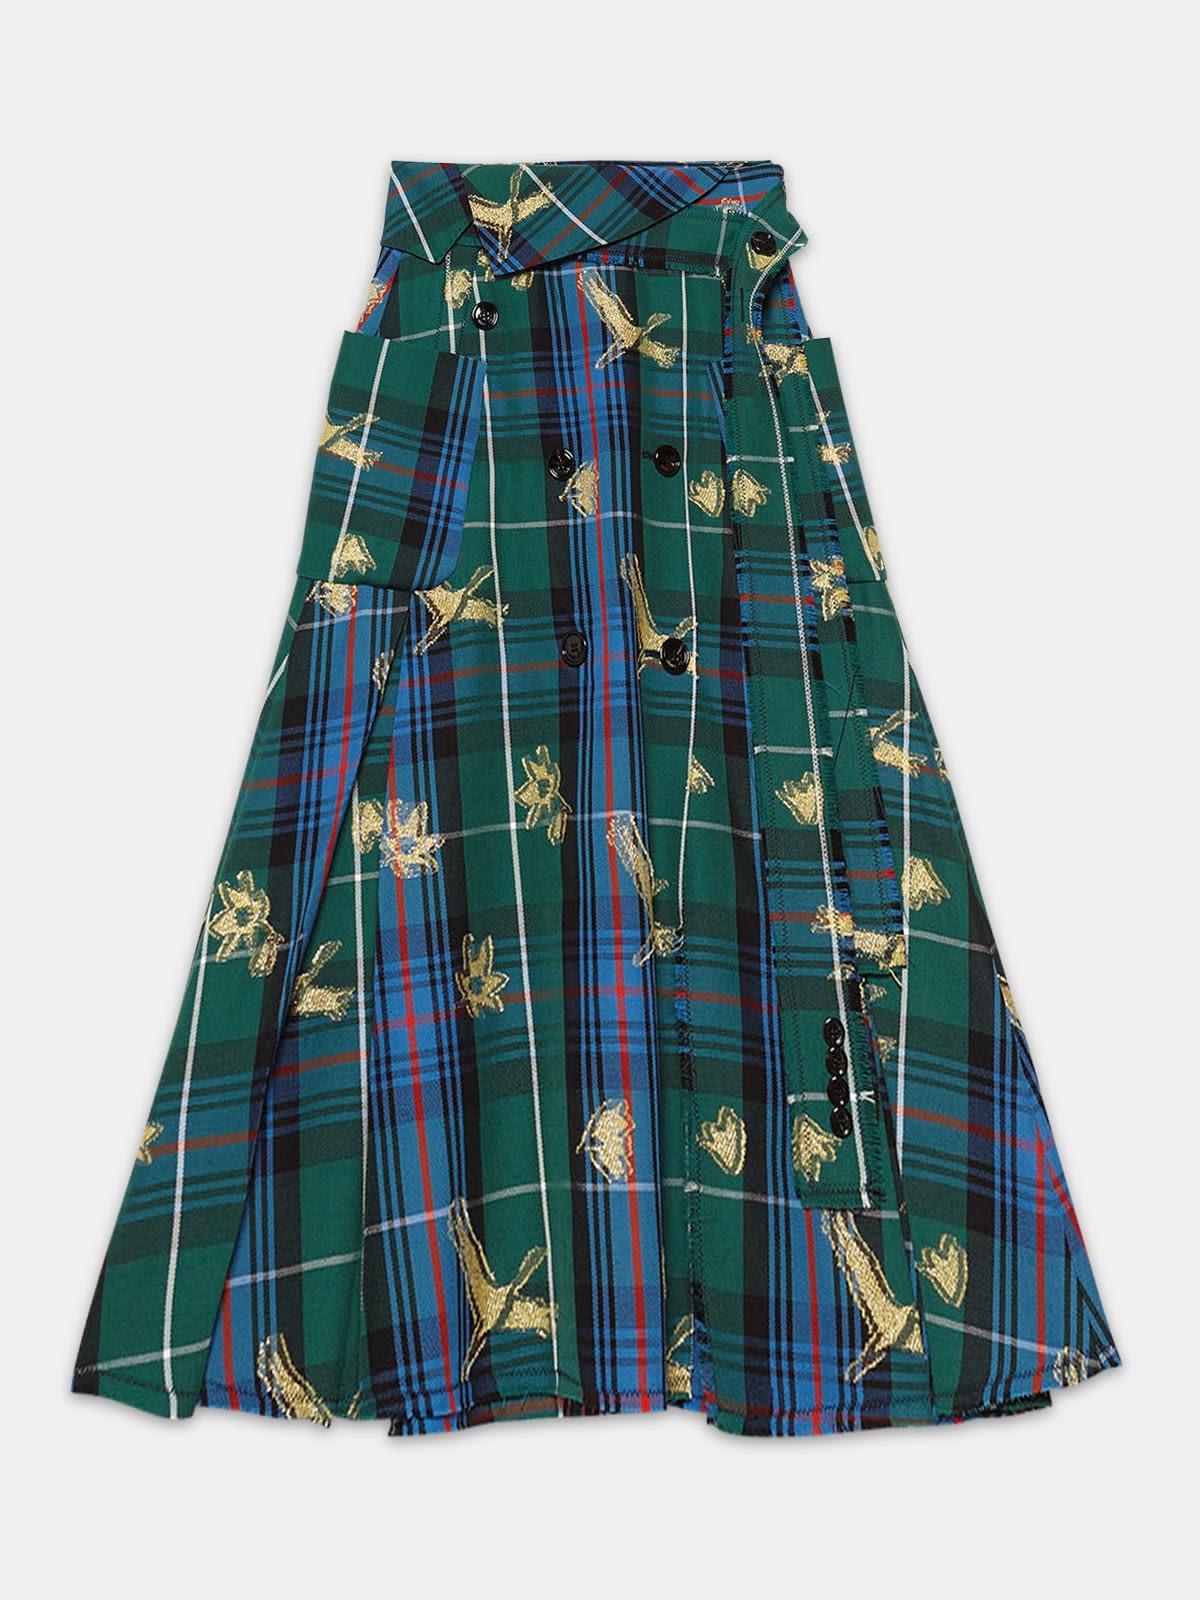 Golden Goose - Makiko skirt in plumetis tartan   in